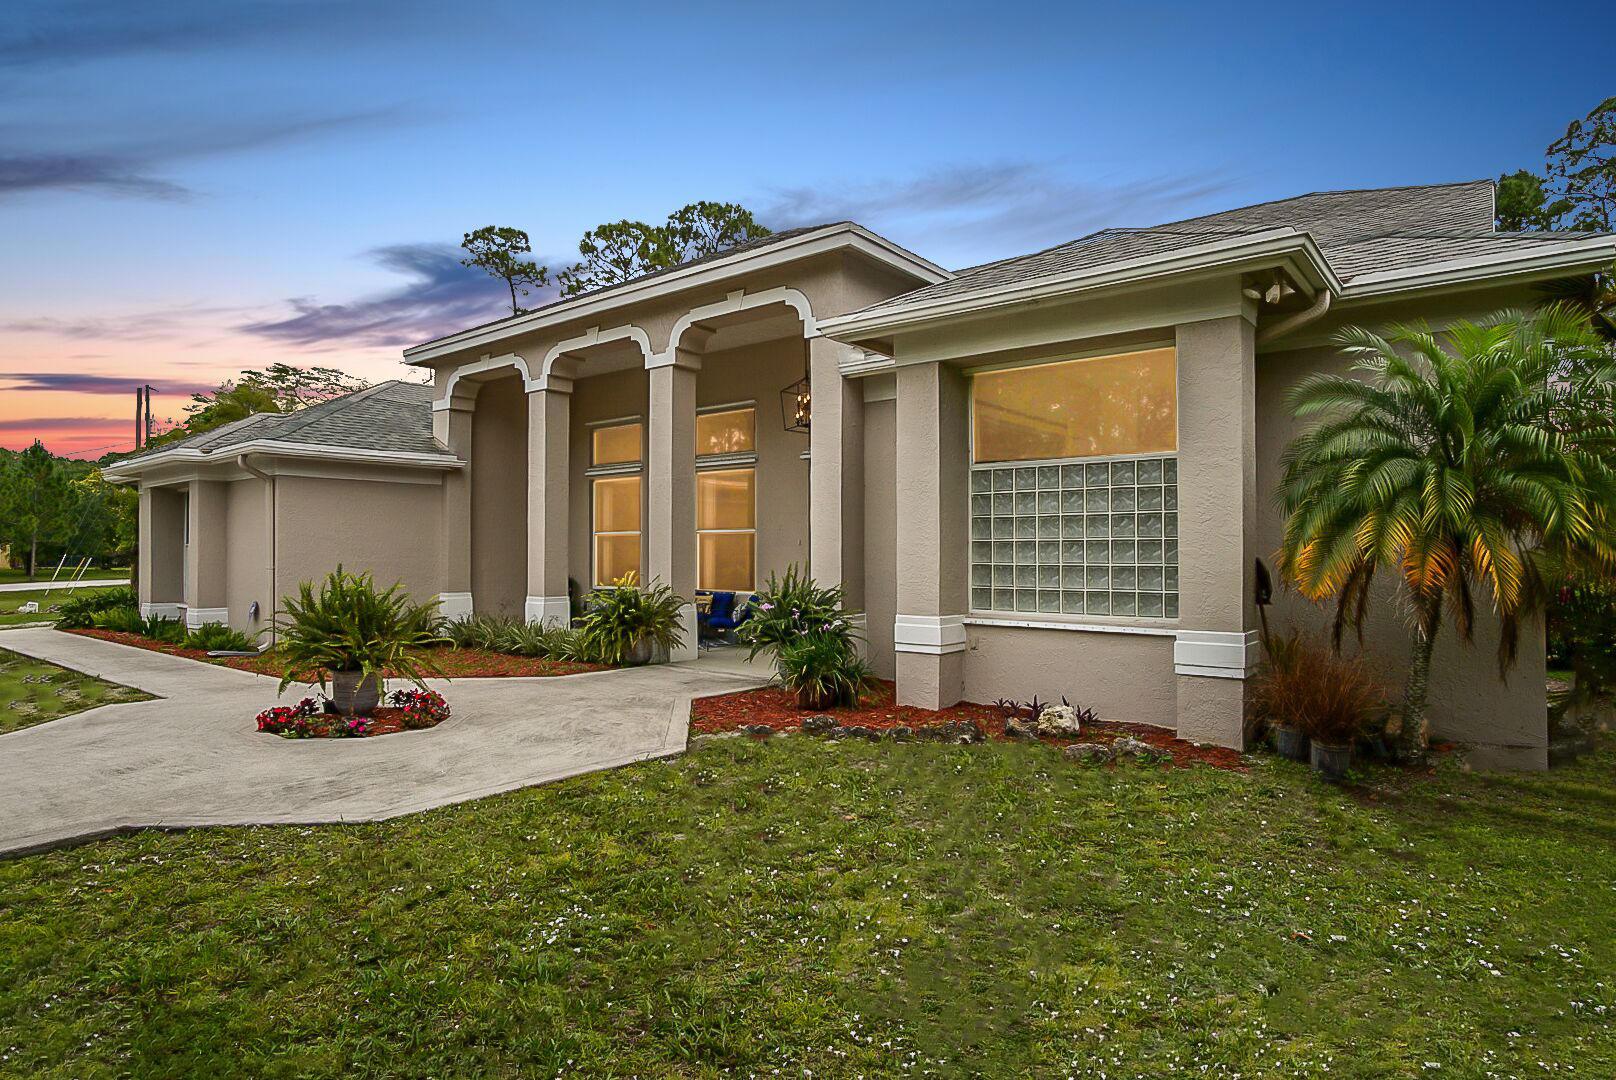 15932 75th Lane - Loxahatchee, Florida